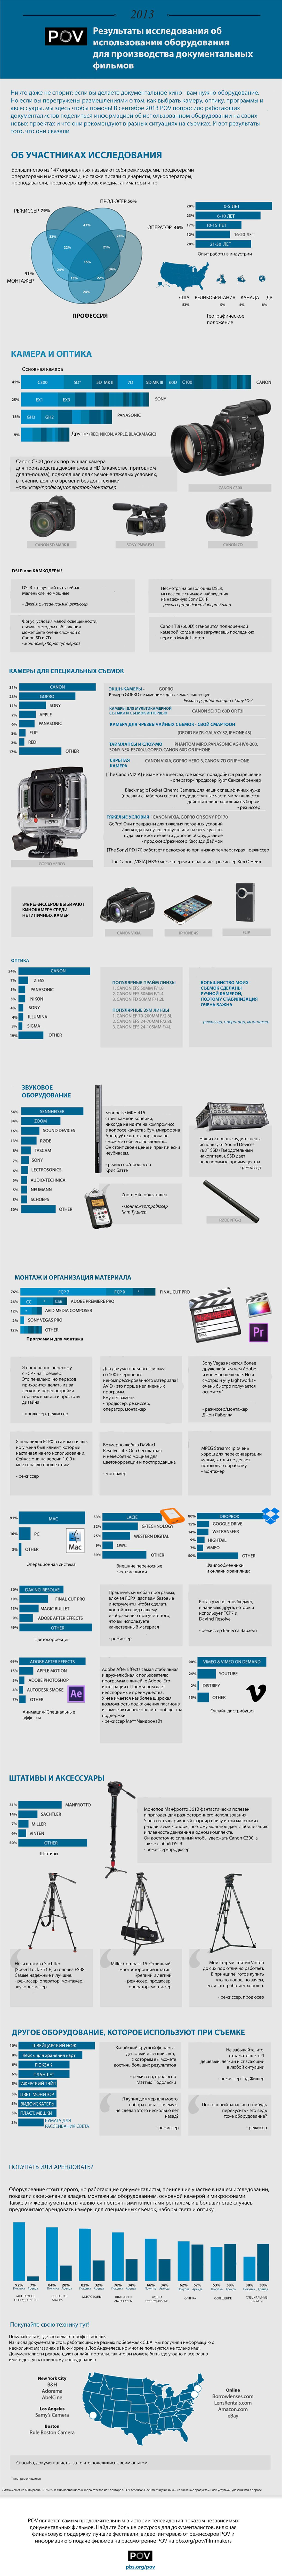 2013-pov-doctools-7342